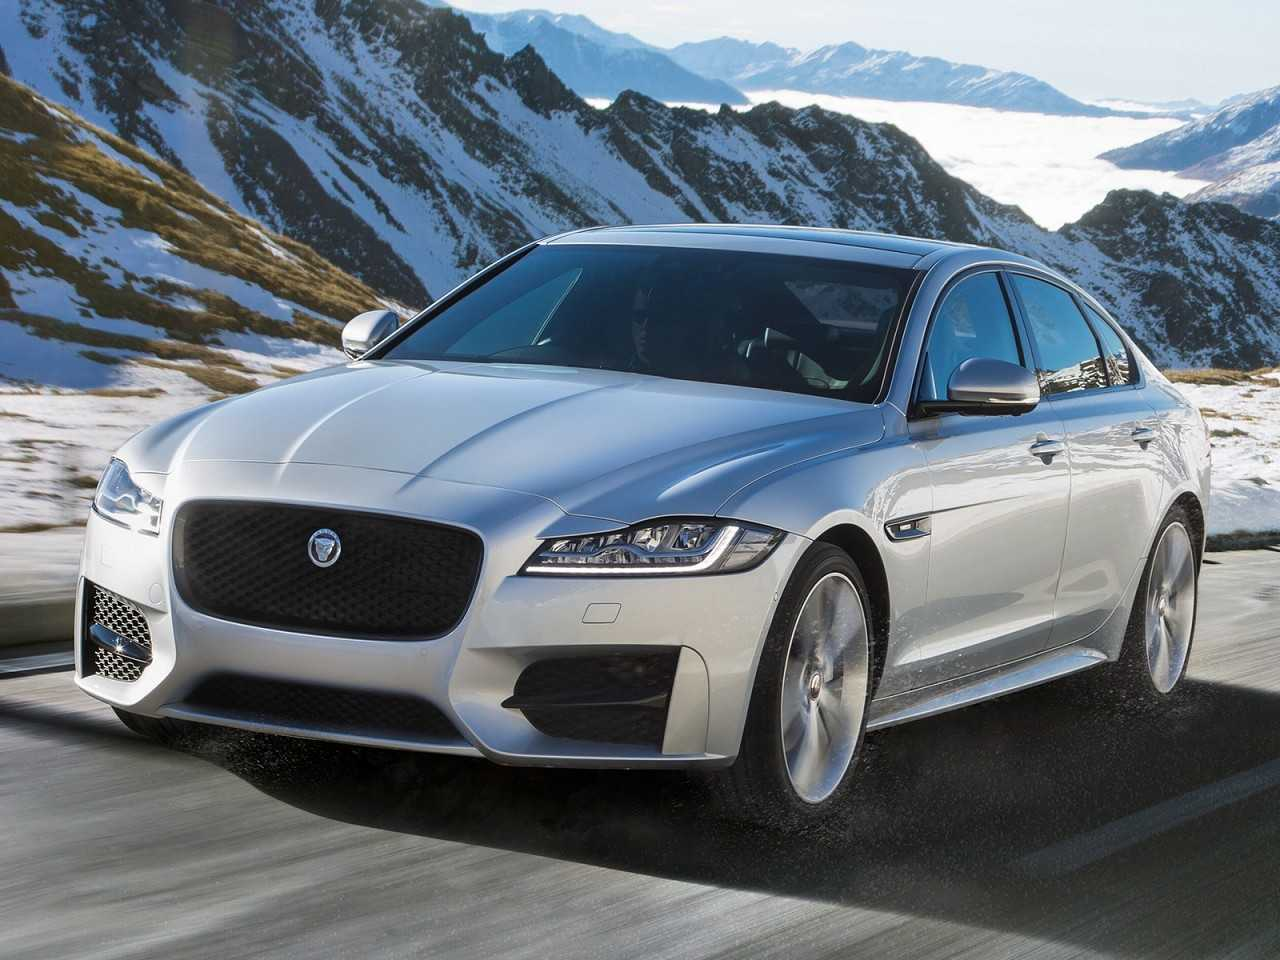 JaguarXF 2016 - ângulo frontal